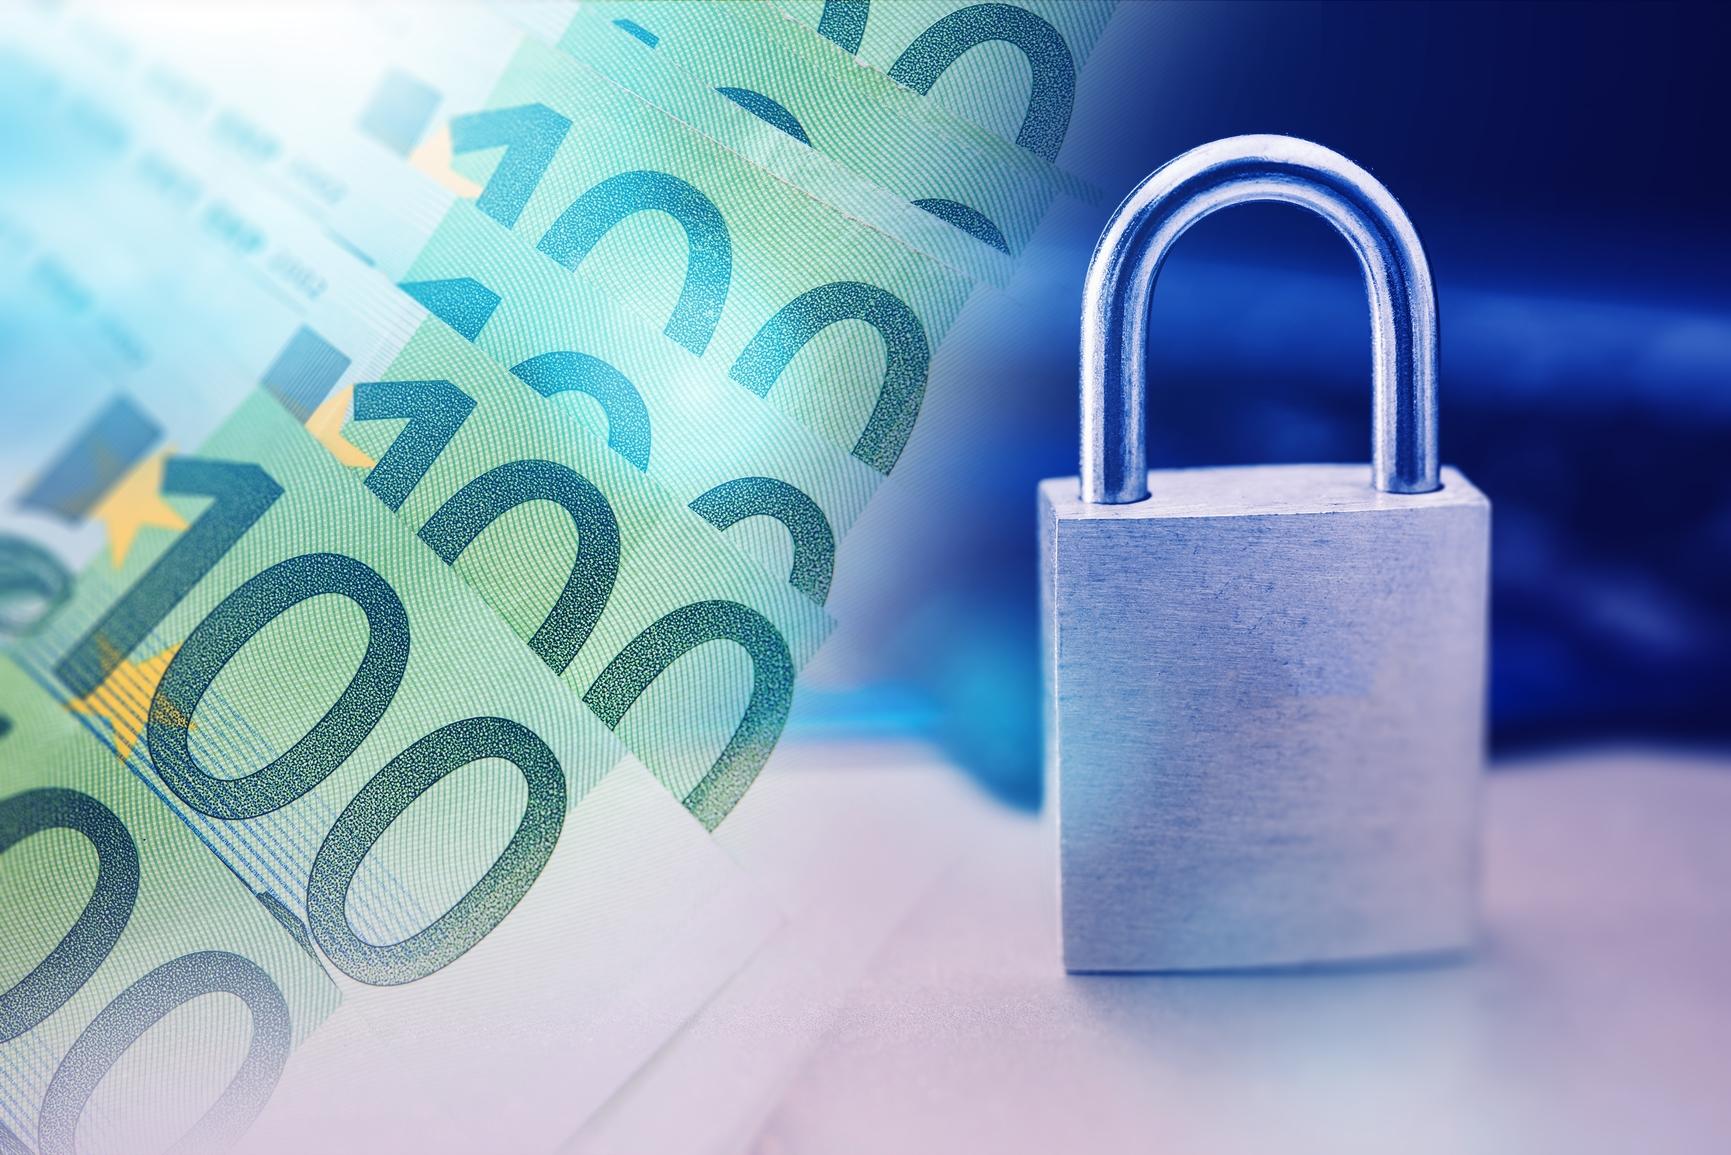 Safe Payment Technolog